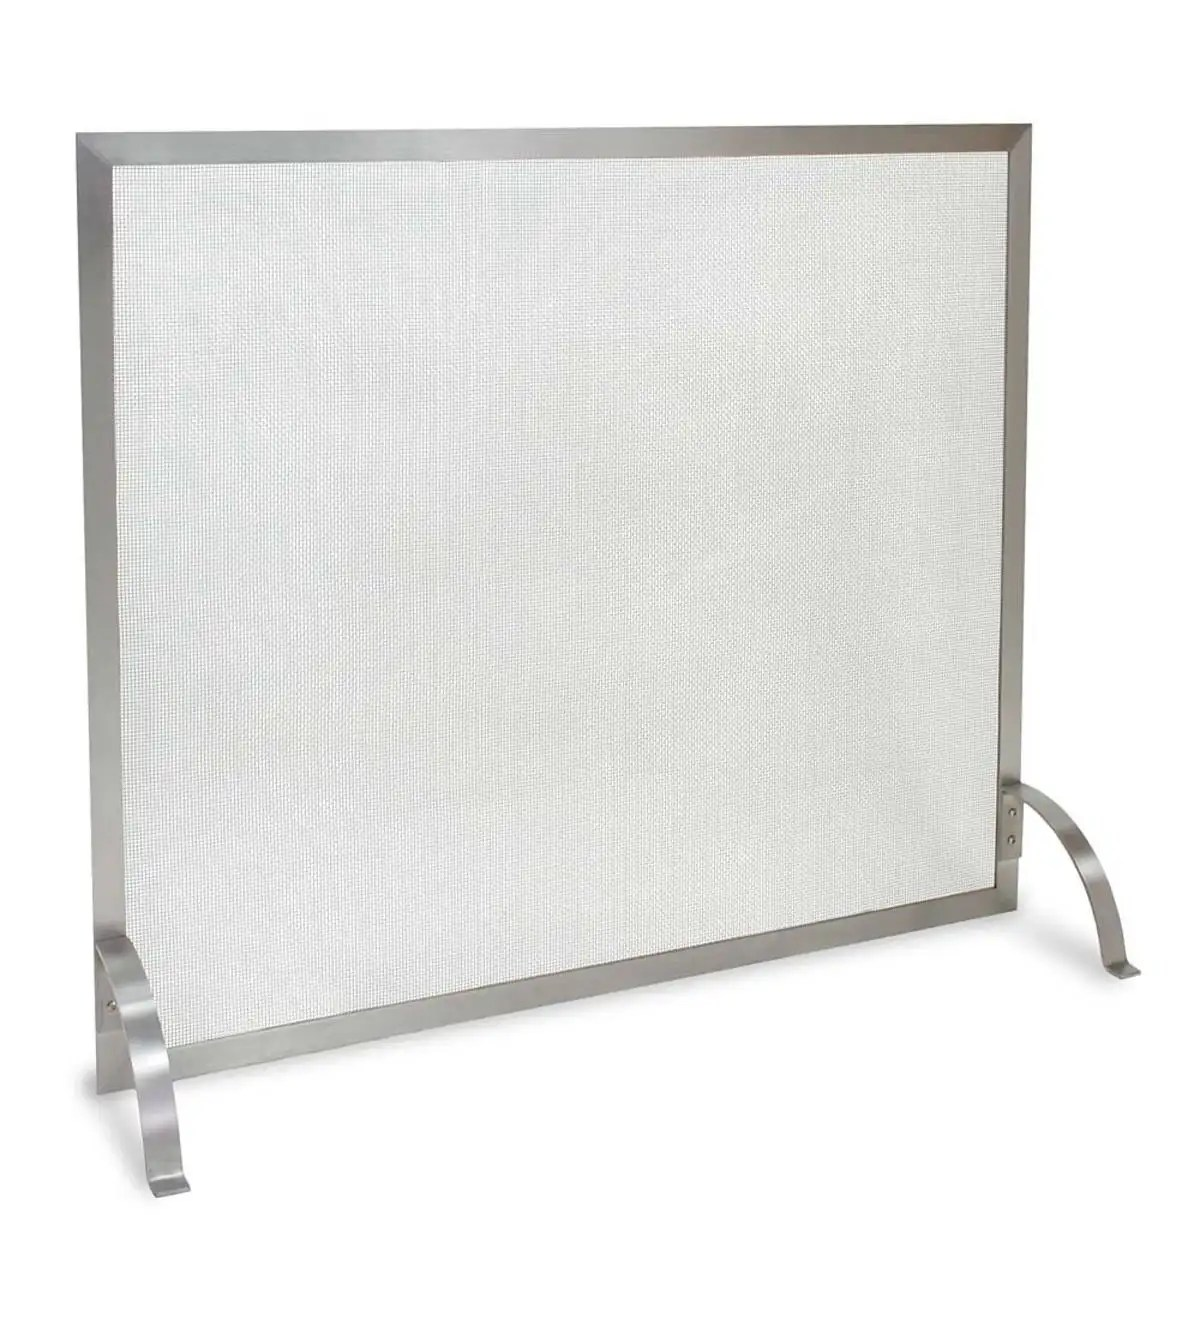 stainless steel newport single panel fireplace screen